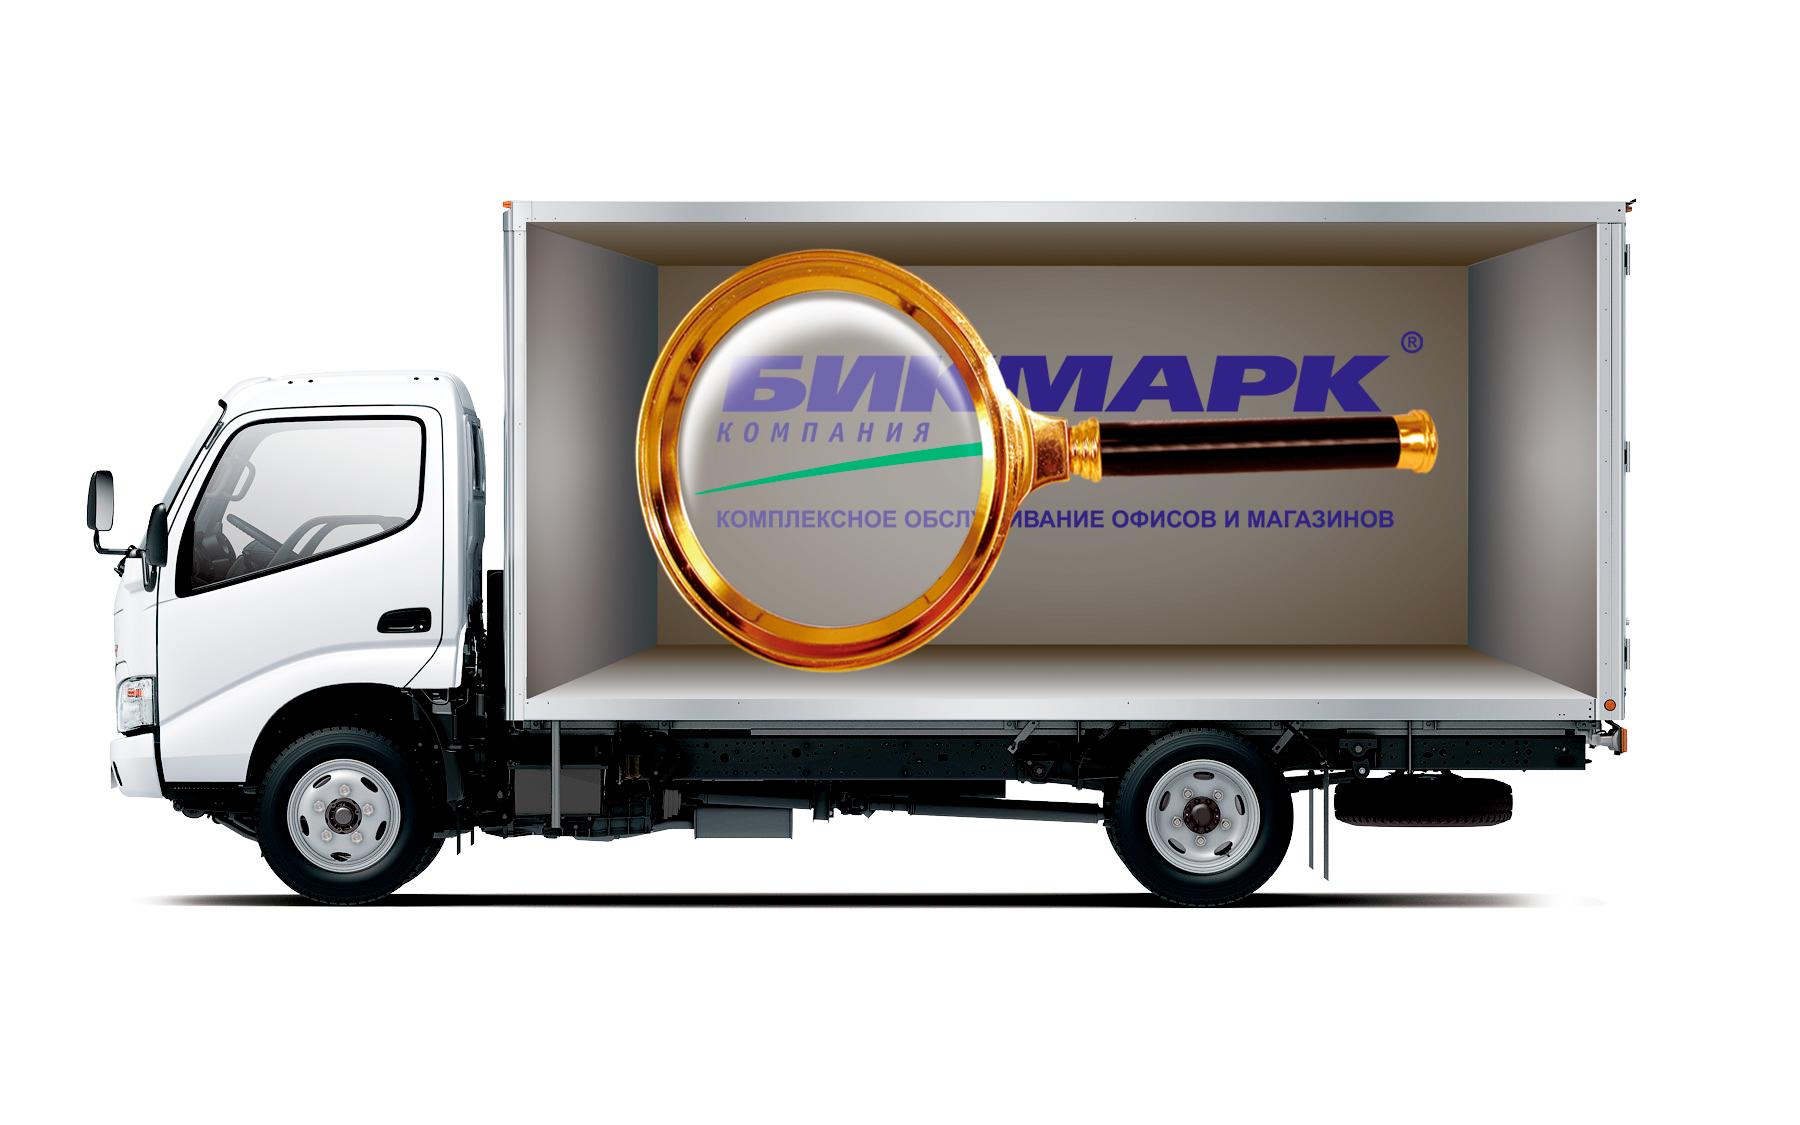 Разработка  рекламы на грузовые машины фото f_6865b2eb324d3edf.jpg